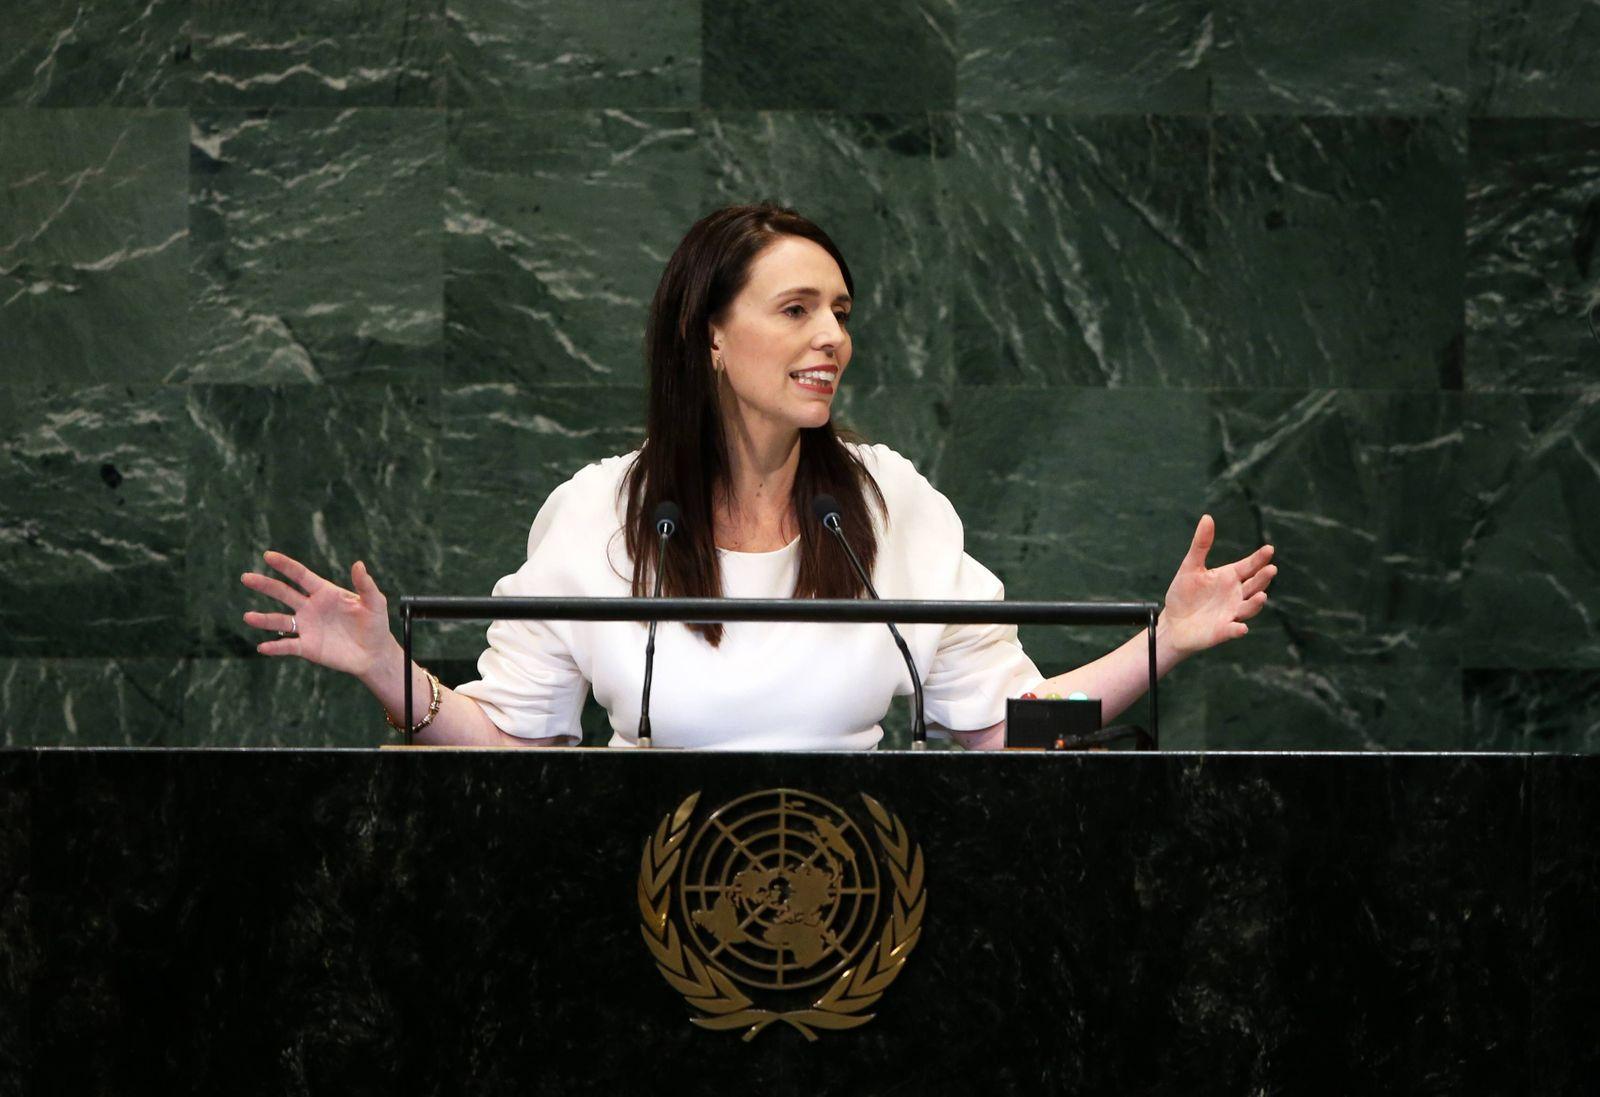 180928 UNITED NATIONS Sept 28 2018 New Zealand Prime Minister Jacinda Ardern addresses t